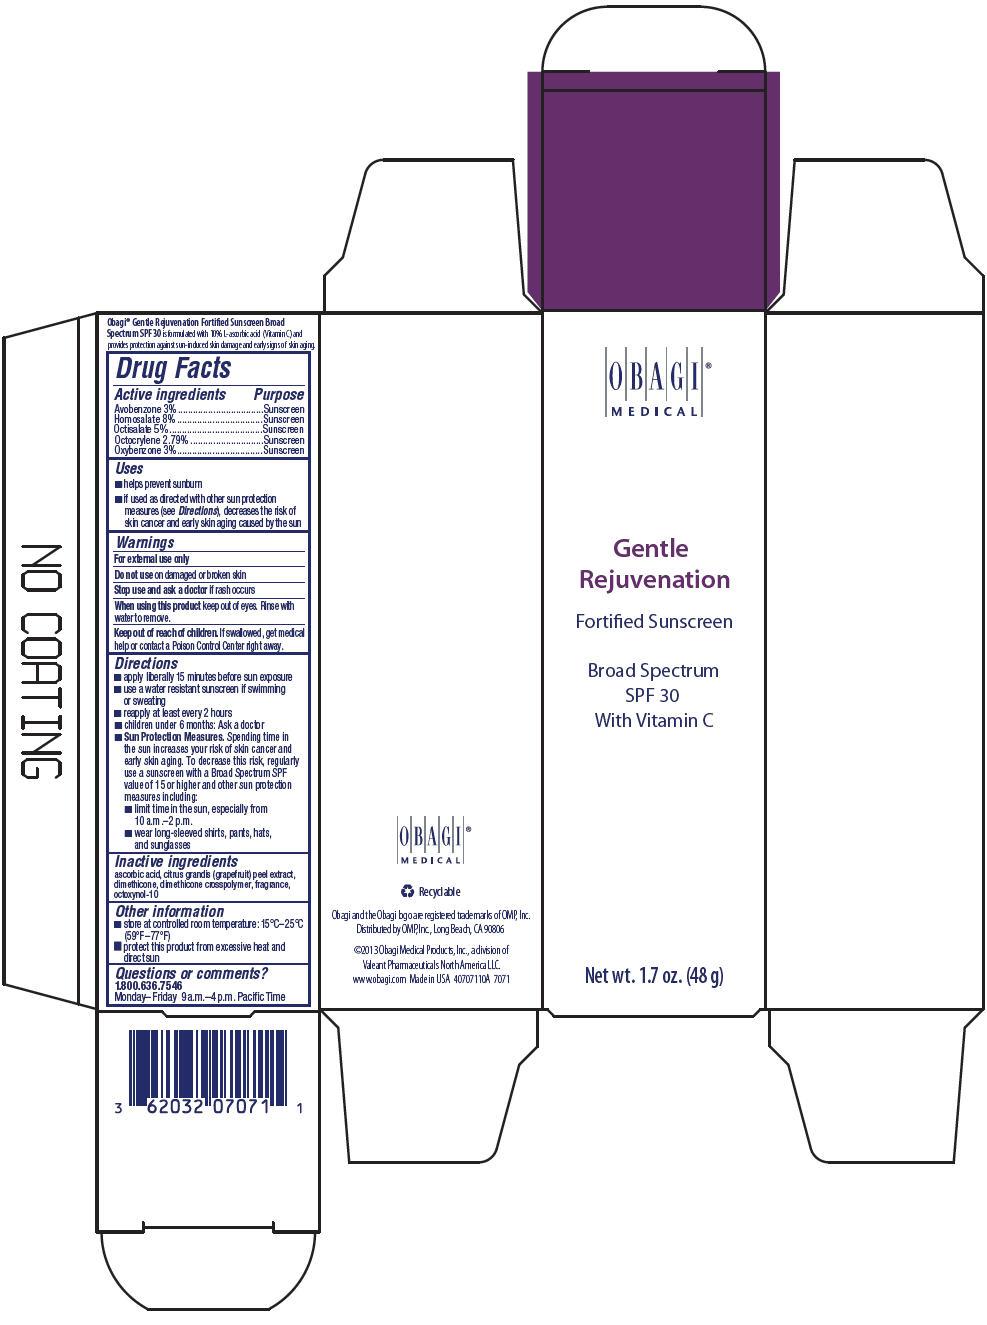 Protonix I.v. (Pantoprazole Sodium) Injection, Powder, For Solution [Cardinal Health]